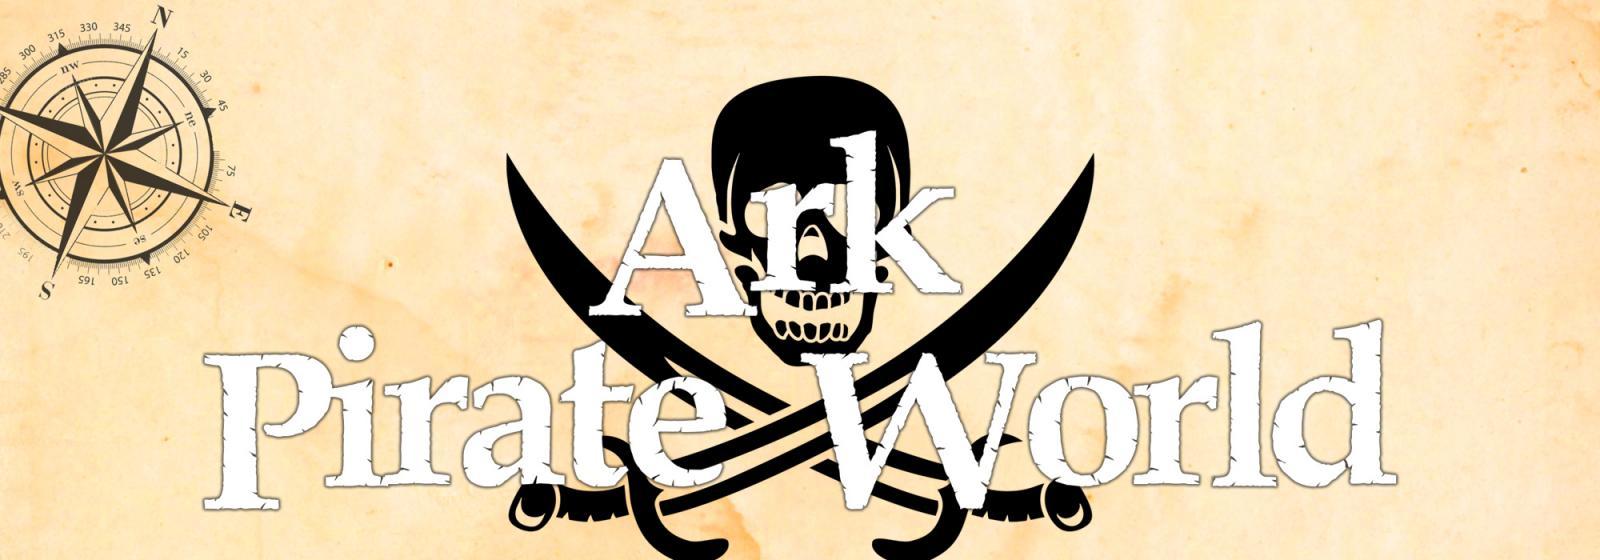 large.567256172170f_1447381940_Pirates1.